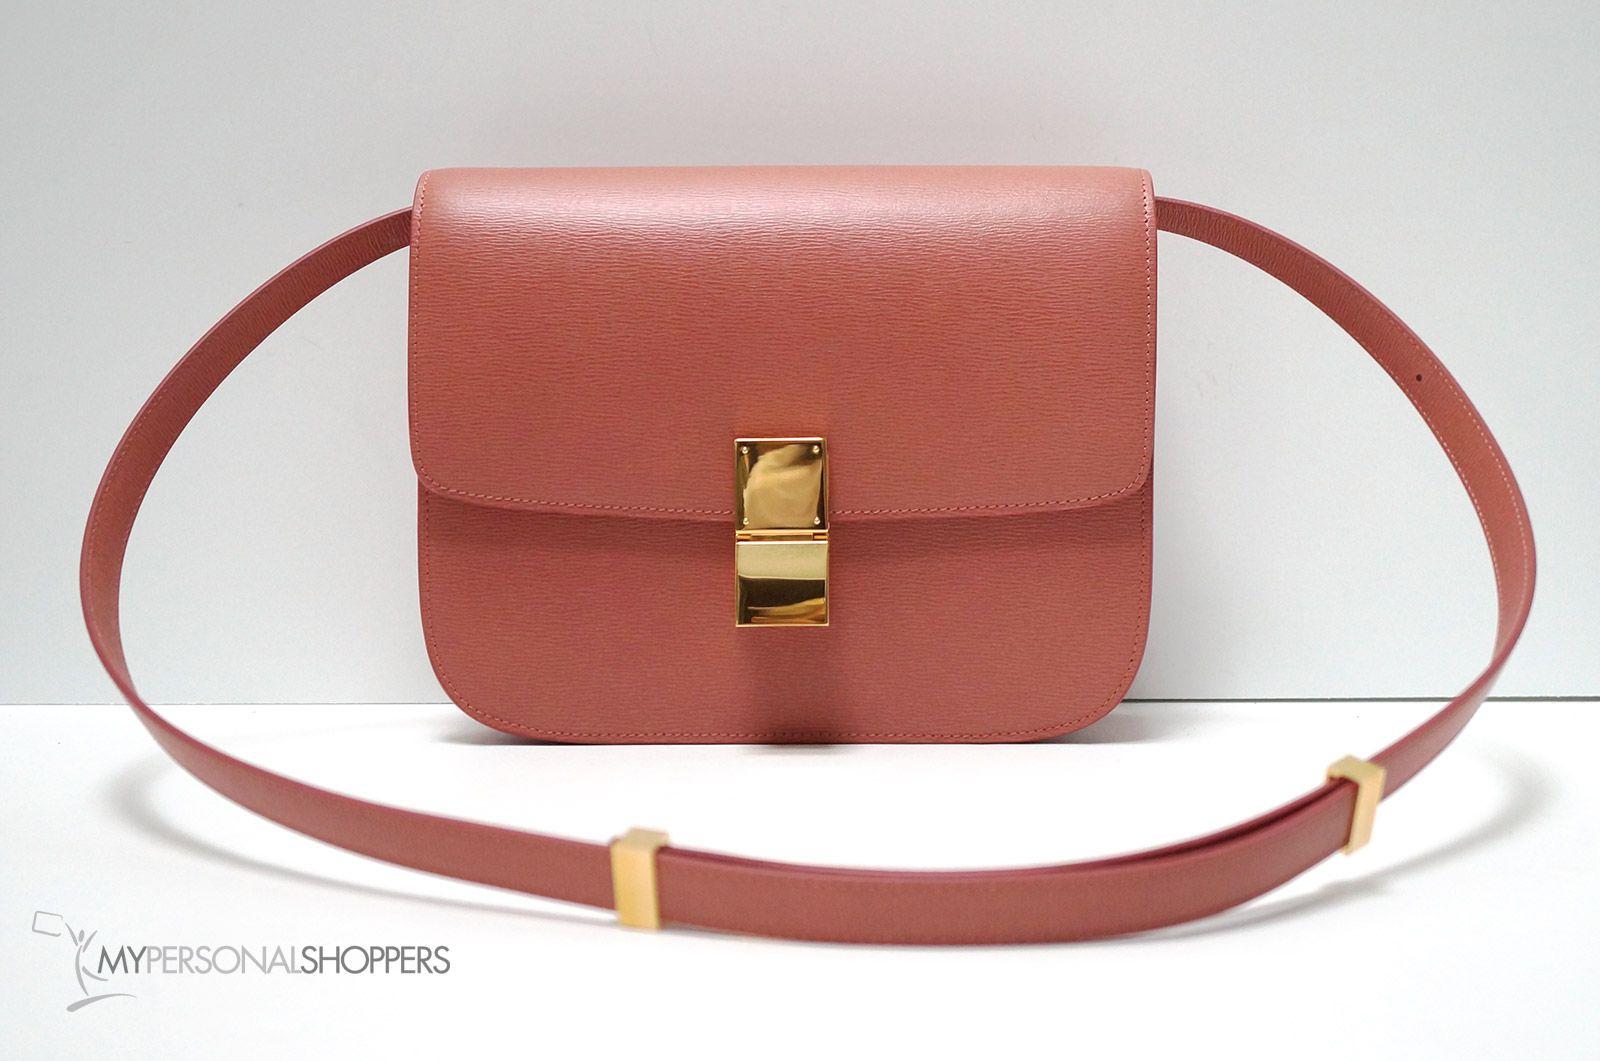 Celine Classic Terracotta Medium Textured Leather Box Bag 5361261193384